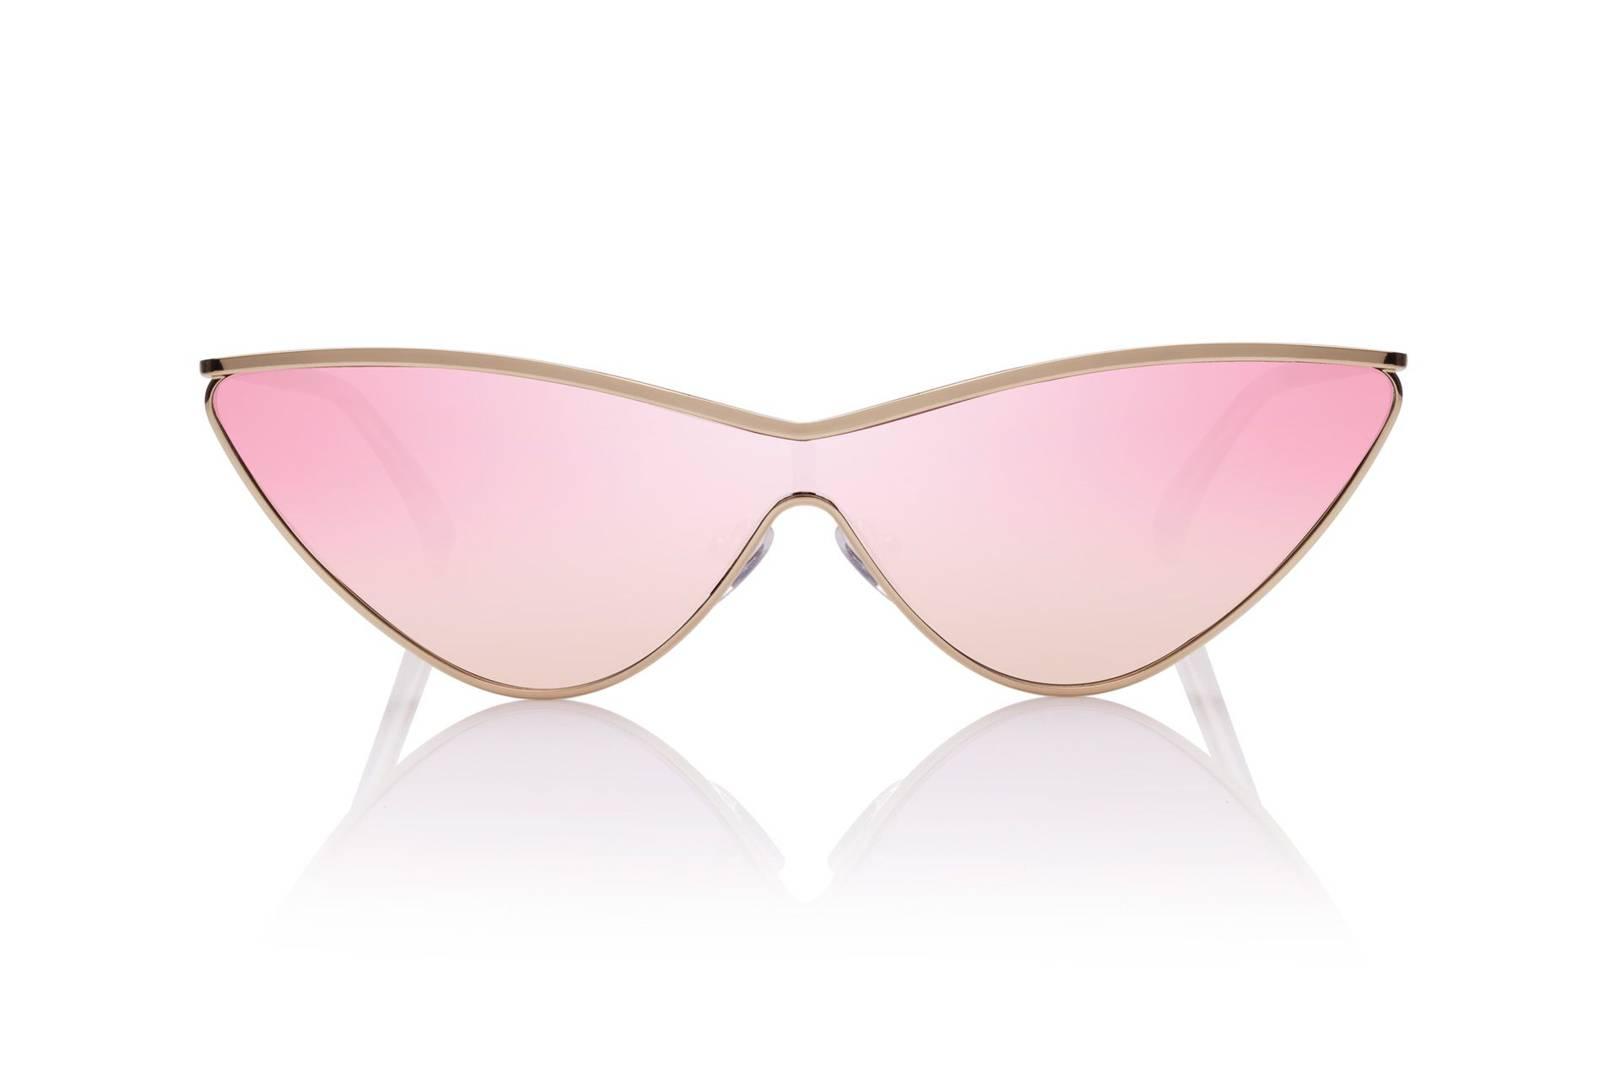 a91531743e74 Best Sunglasses 2017 | British Vogue